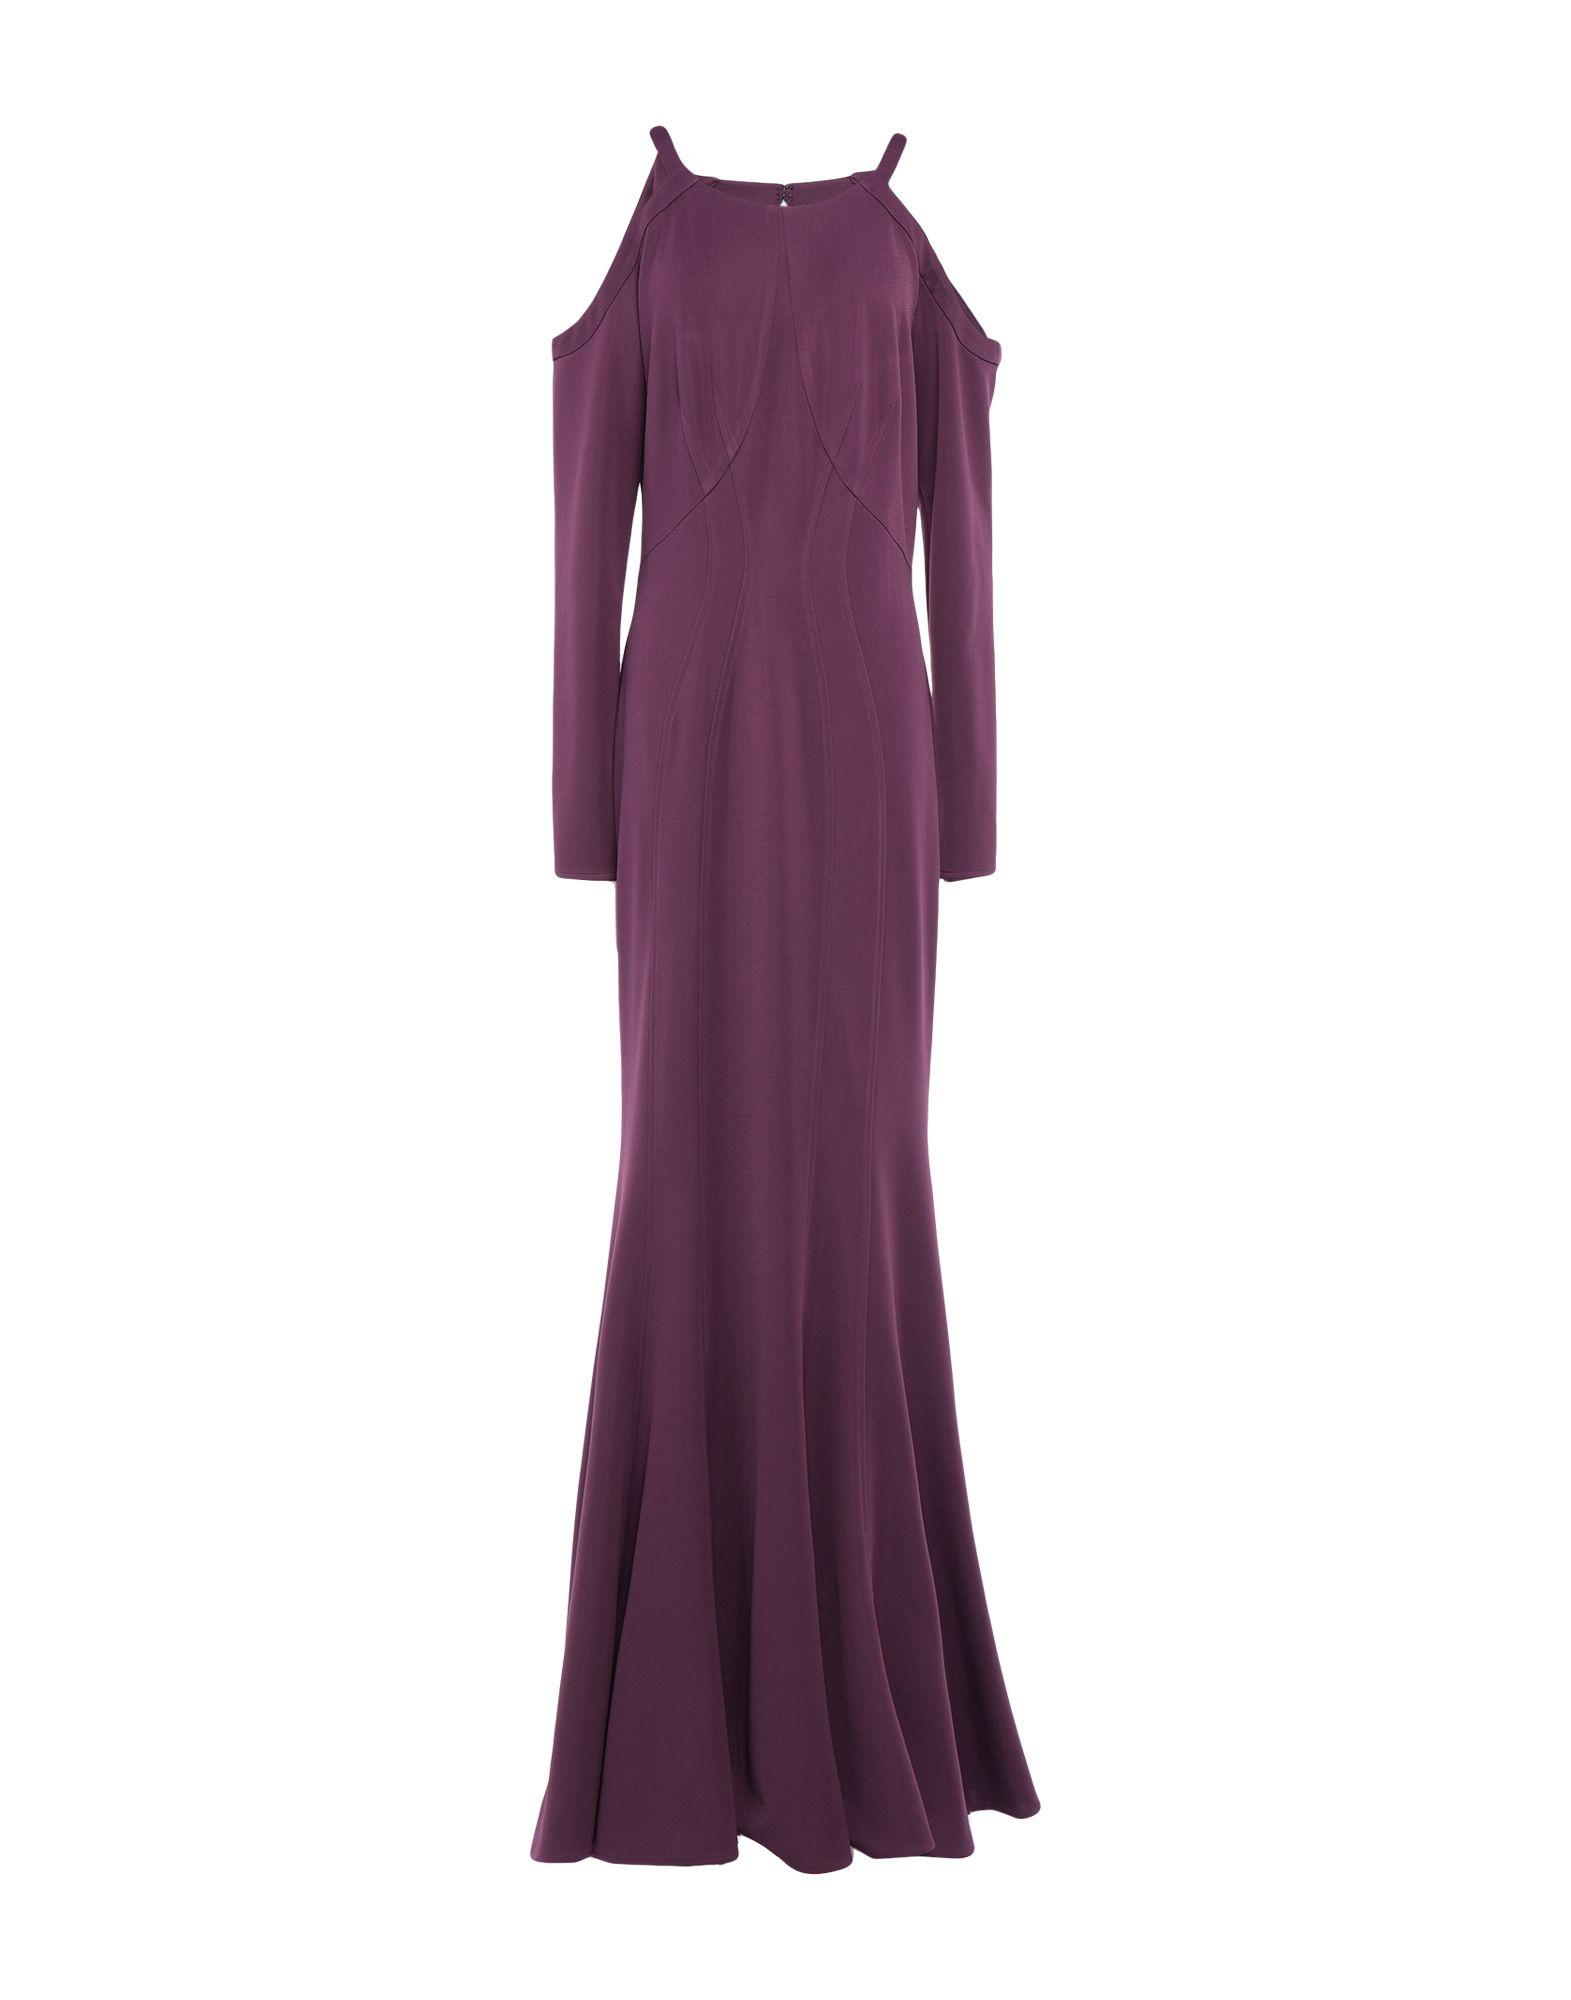 ZAC ZAC POSEN Длинное платье